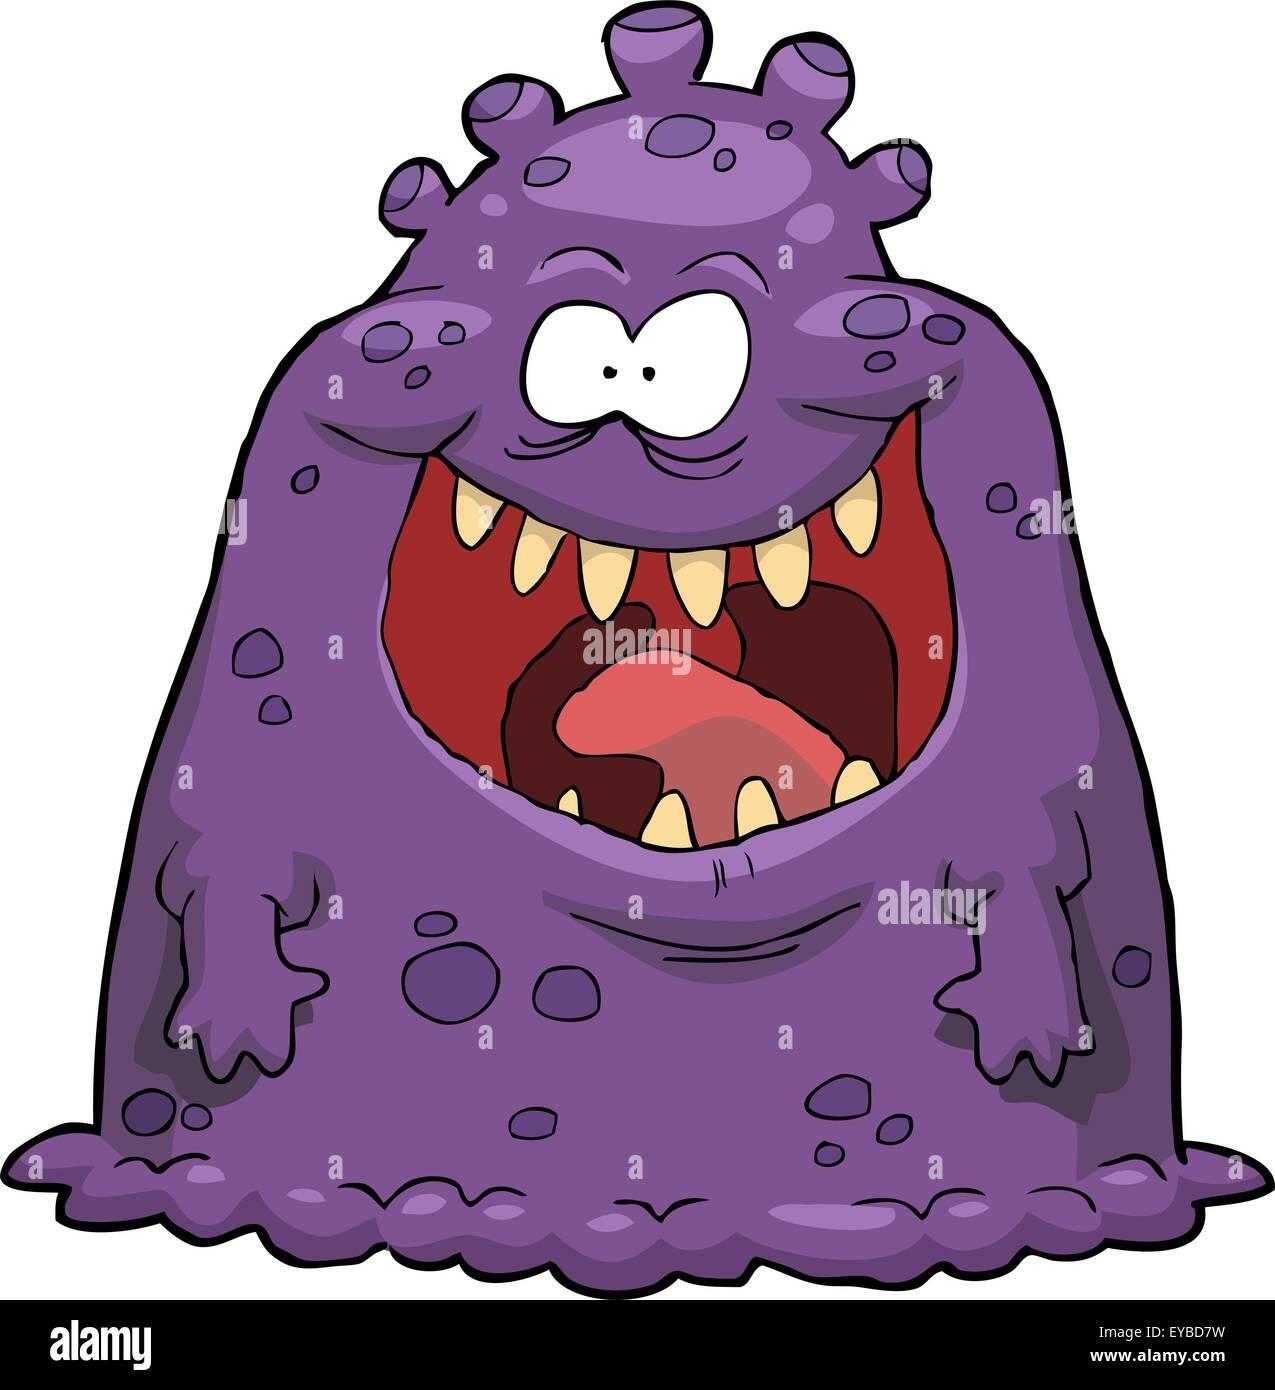 Purple virus on a white background vector illustration - Stock Image